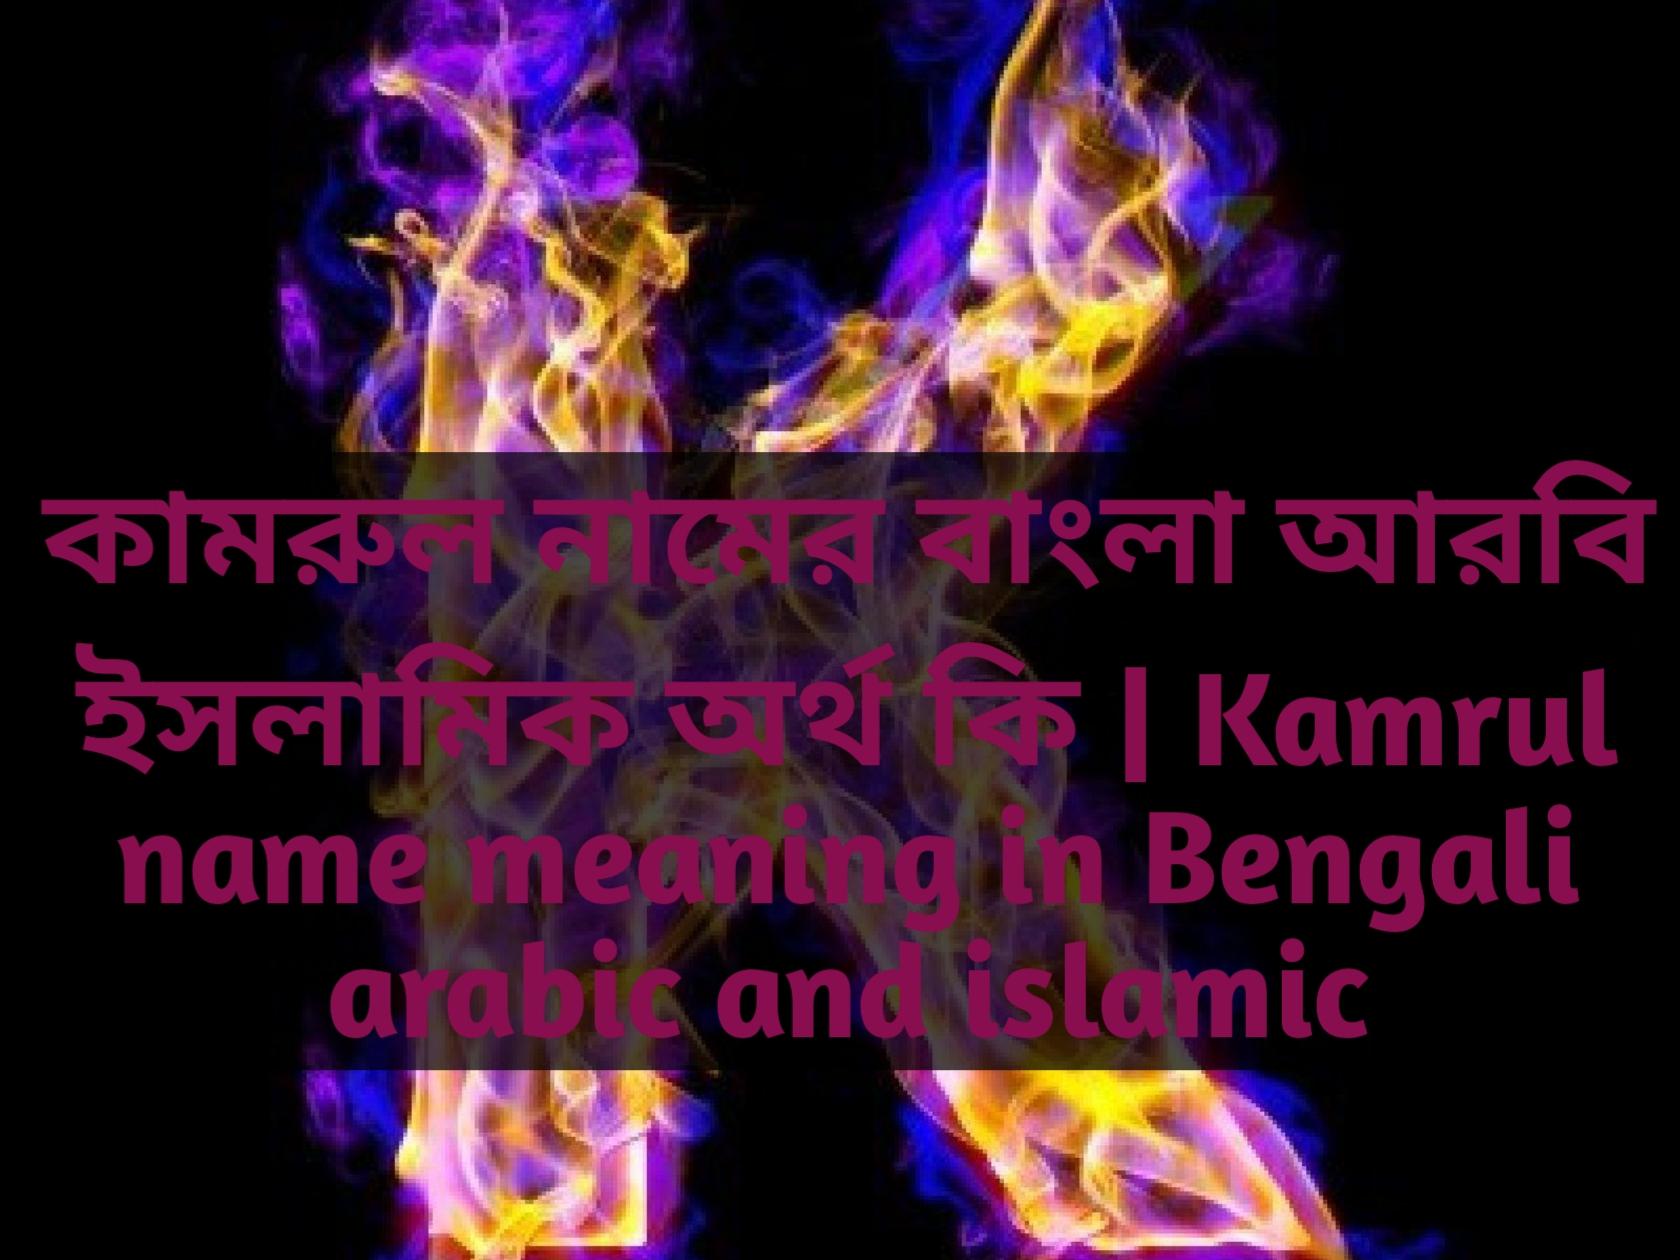 Kamrul name meaning in Bengali, কামরুল নামের অর্থ কি, কামরুল নামের বাংলা অর্থ কি, কামরুল নামের ইসলামিক অর্থ কি,